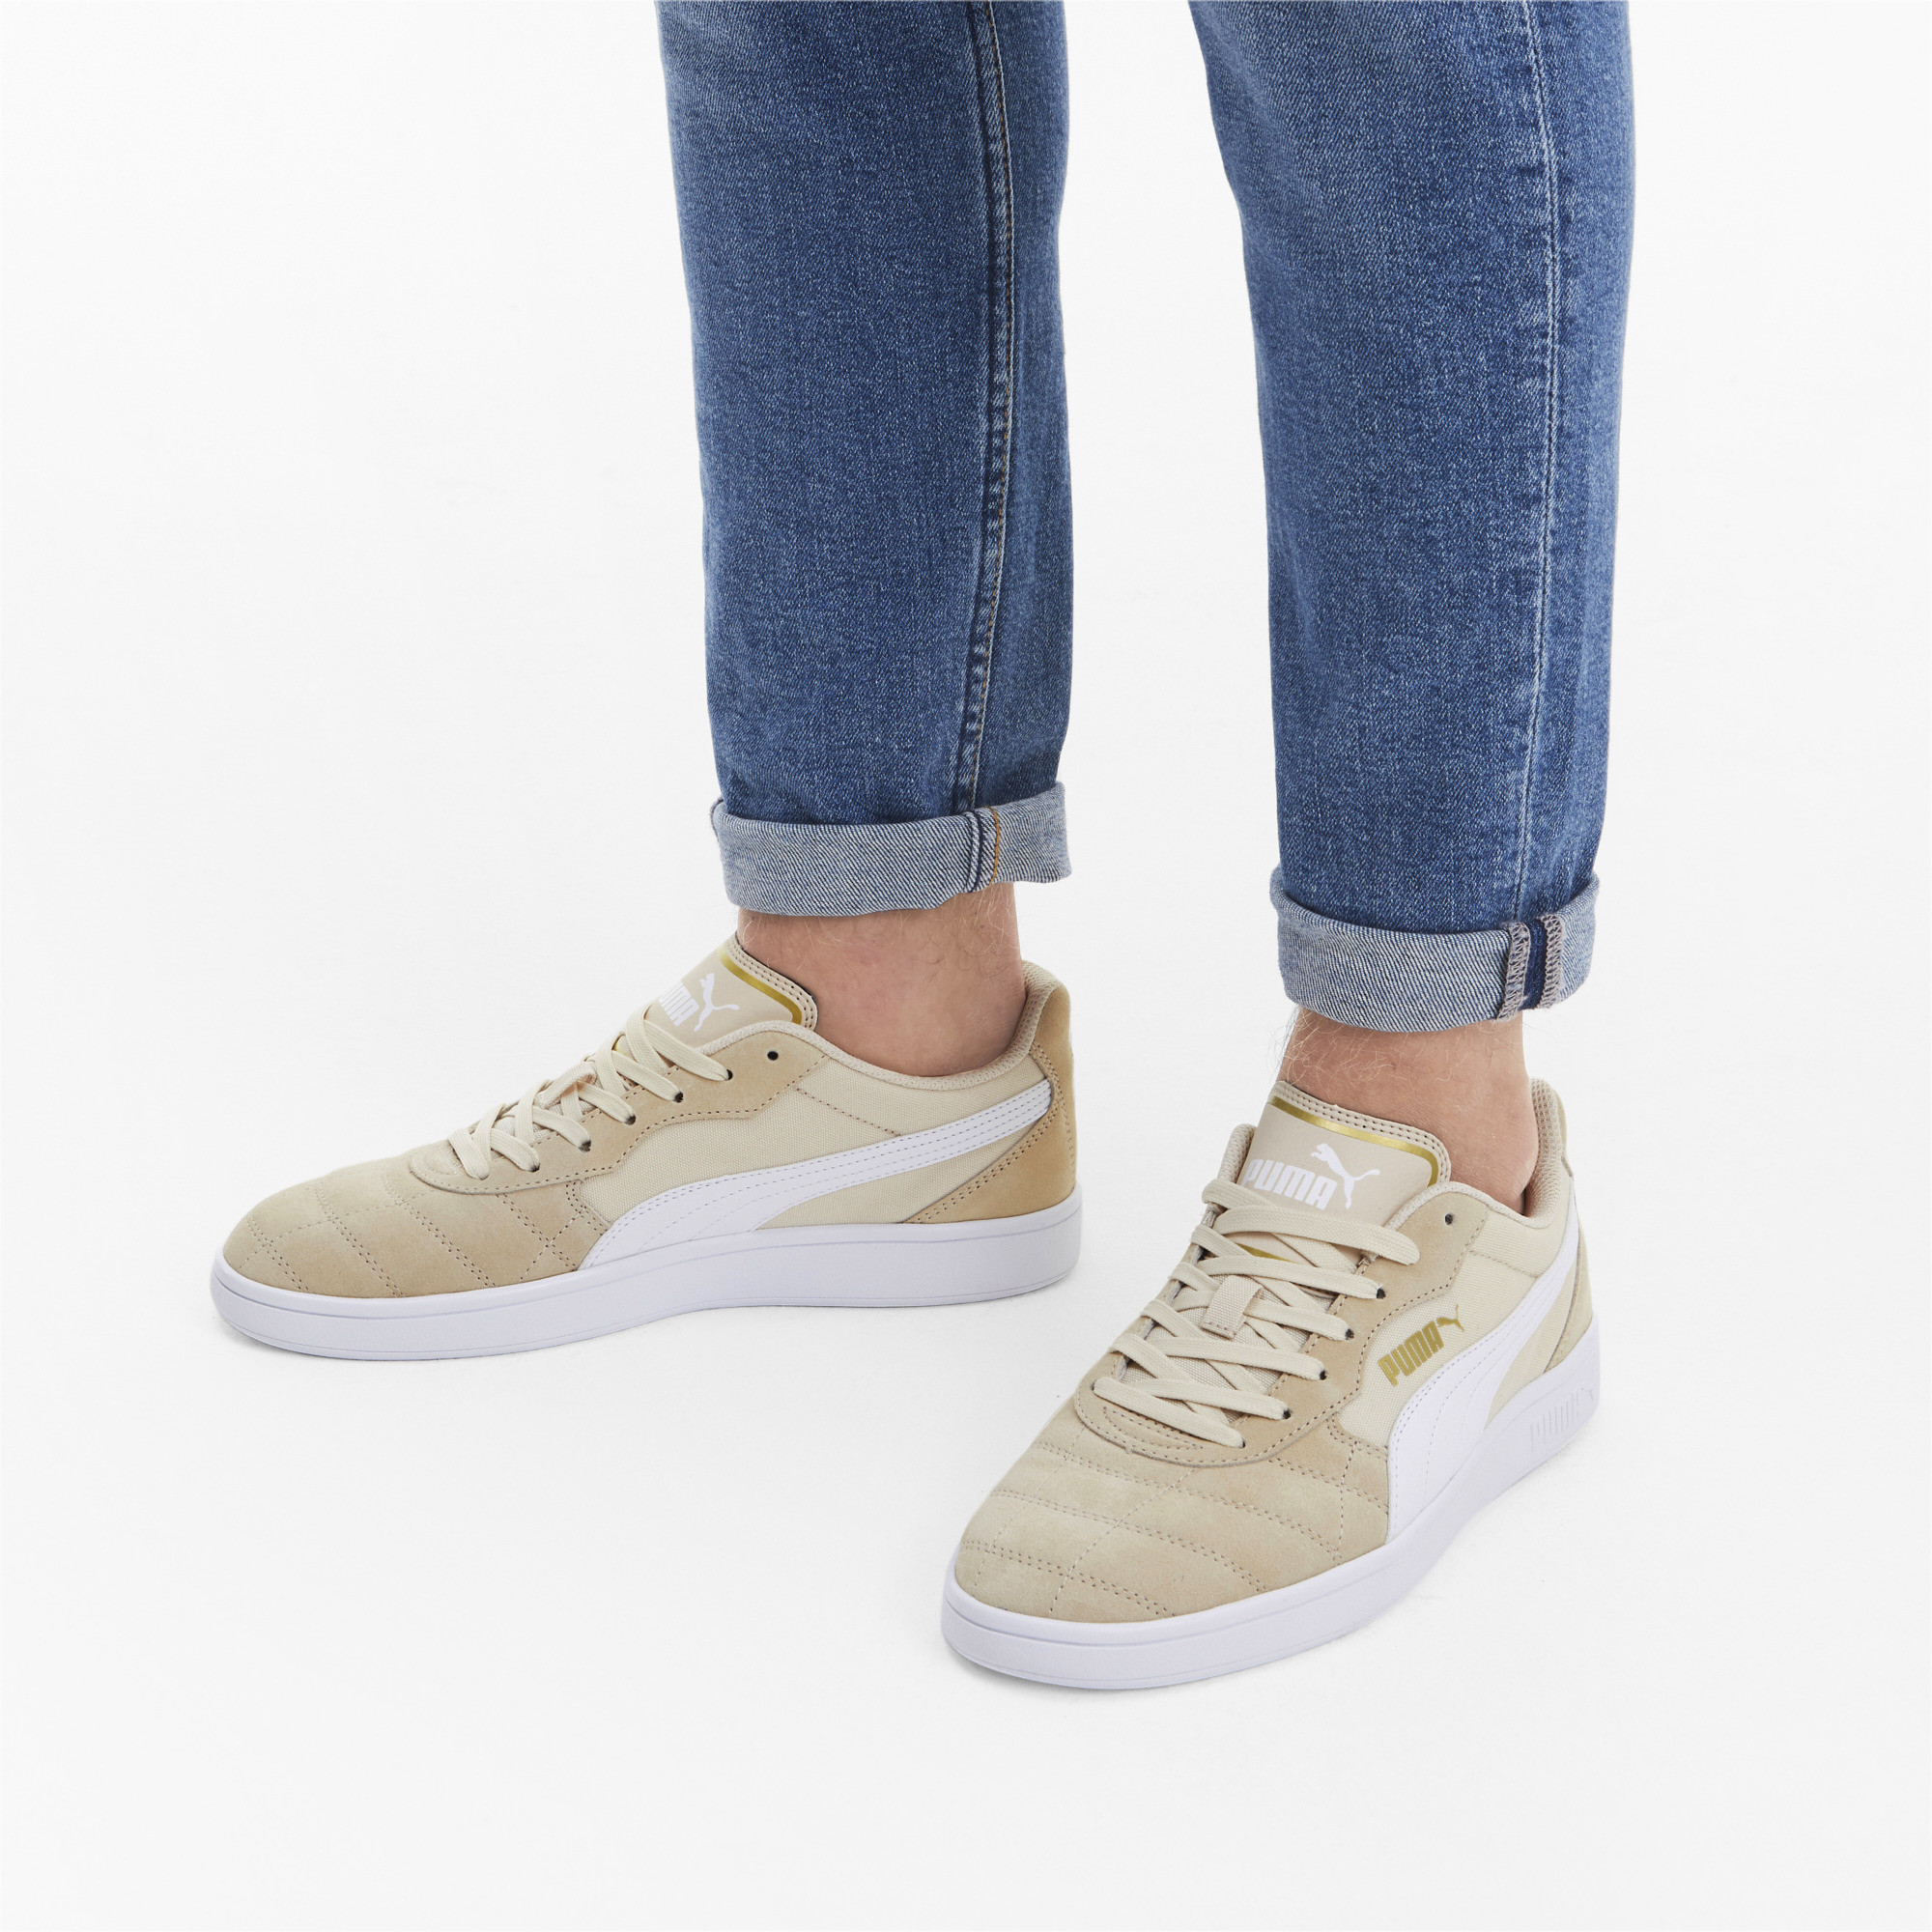 PUMA-Men-039-s-Astro-Kick-Sneakers thumbnail 32